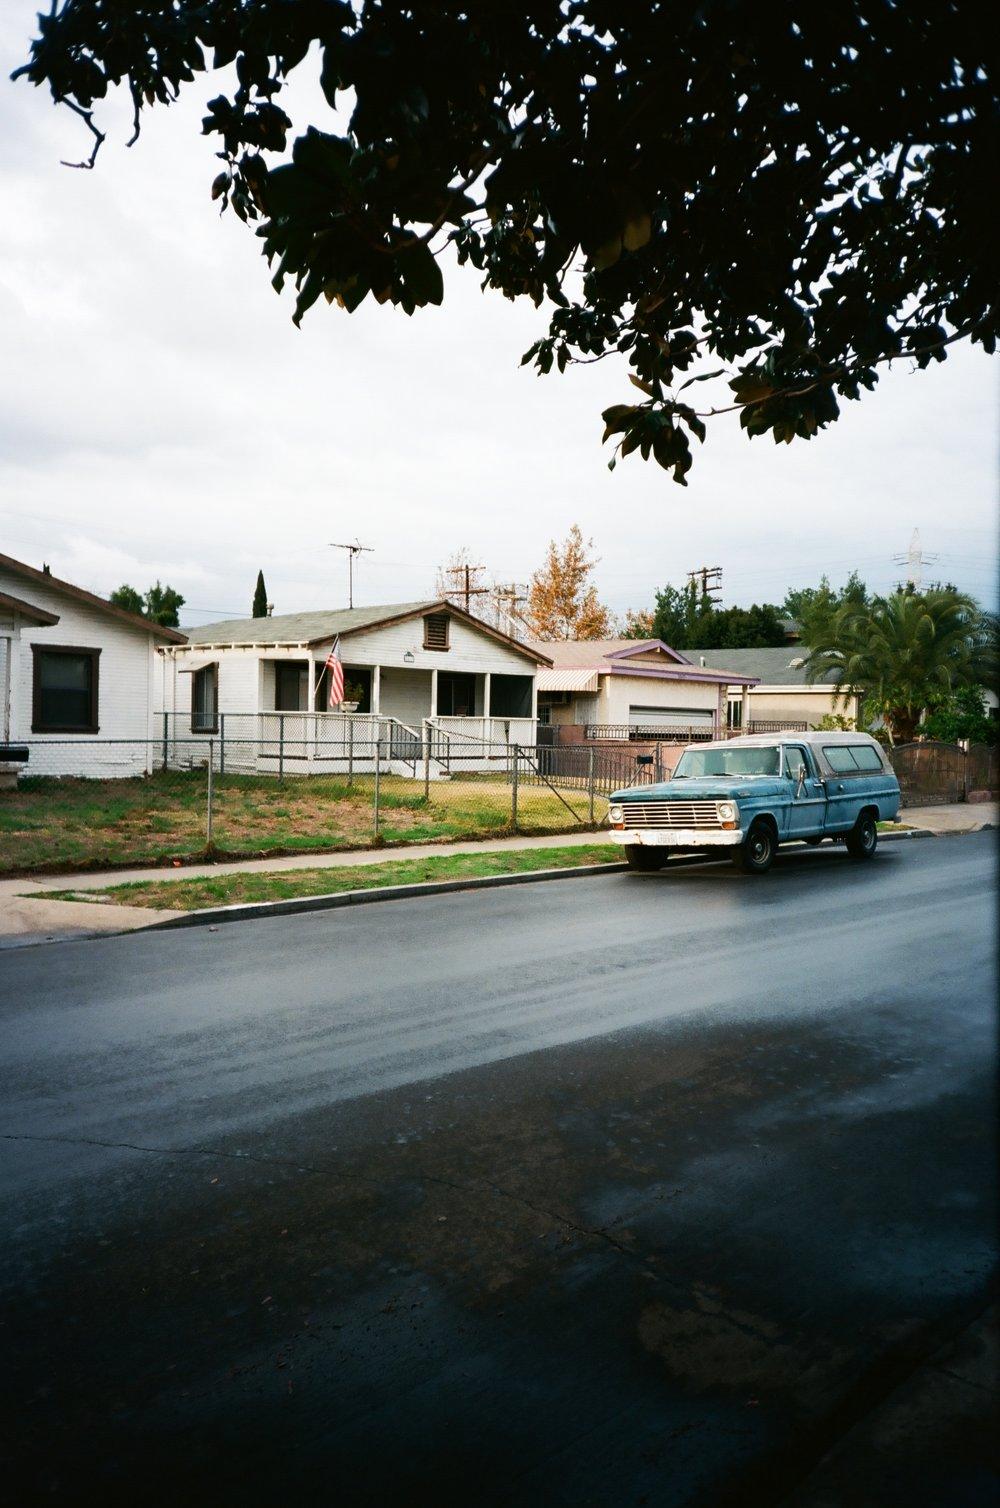 Elysian Valley, California